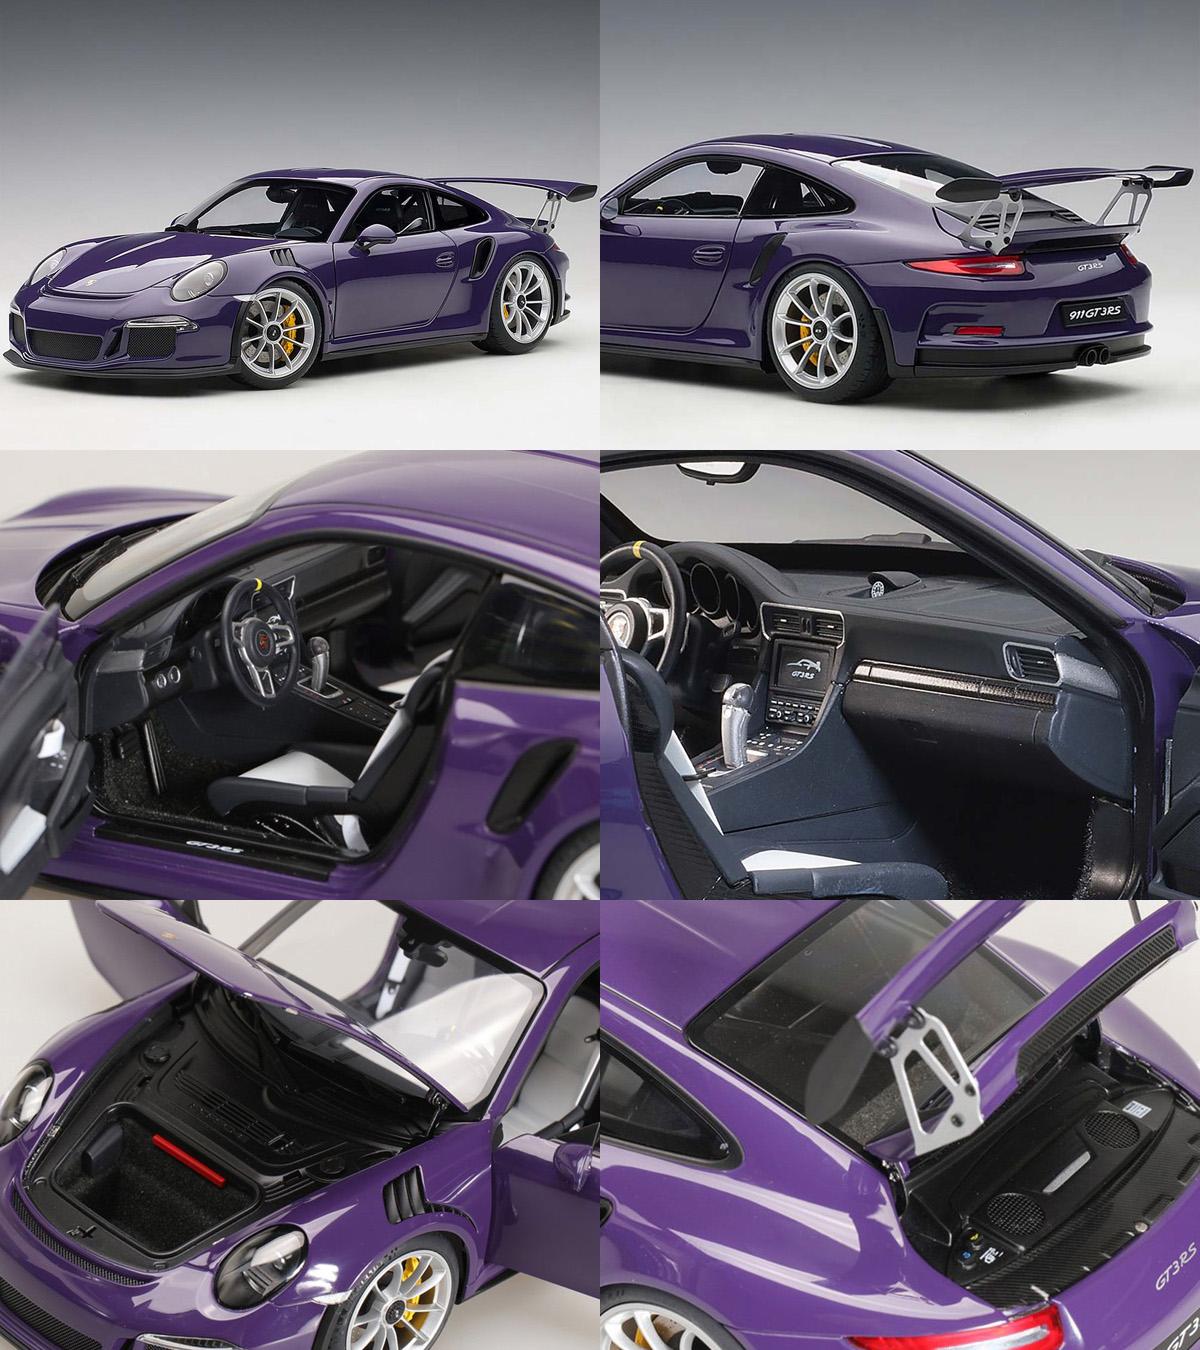 AUTOart 78169 Porsche 911 991 GT3 RS 118 Ultraviolet with Silver Wheels